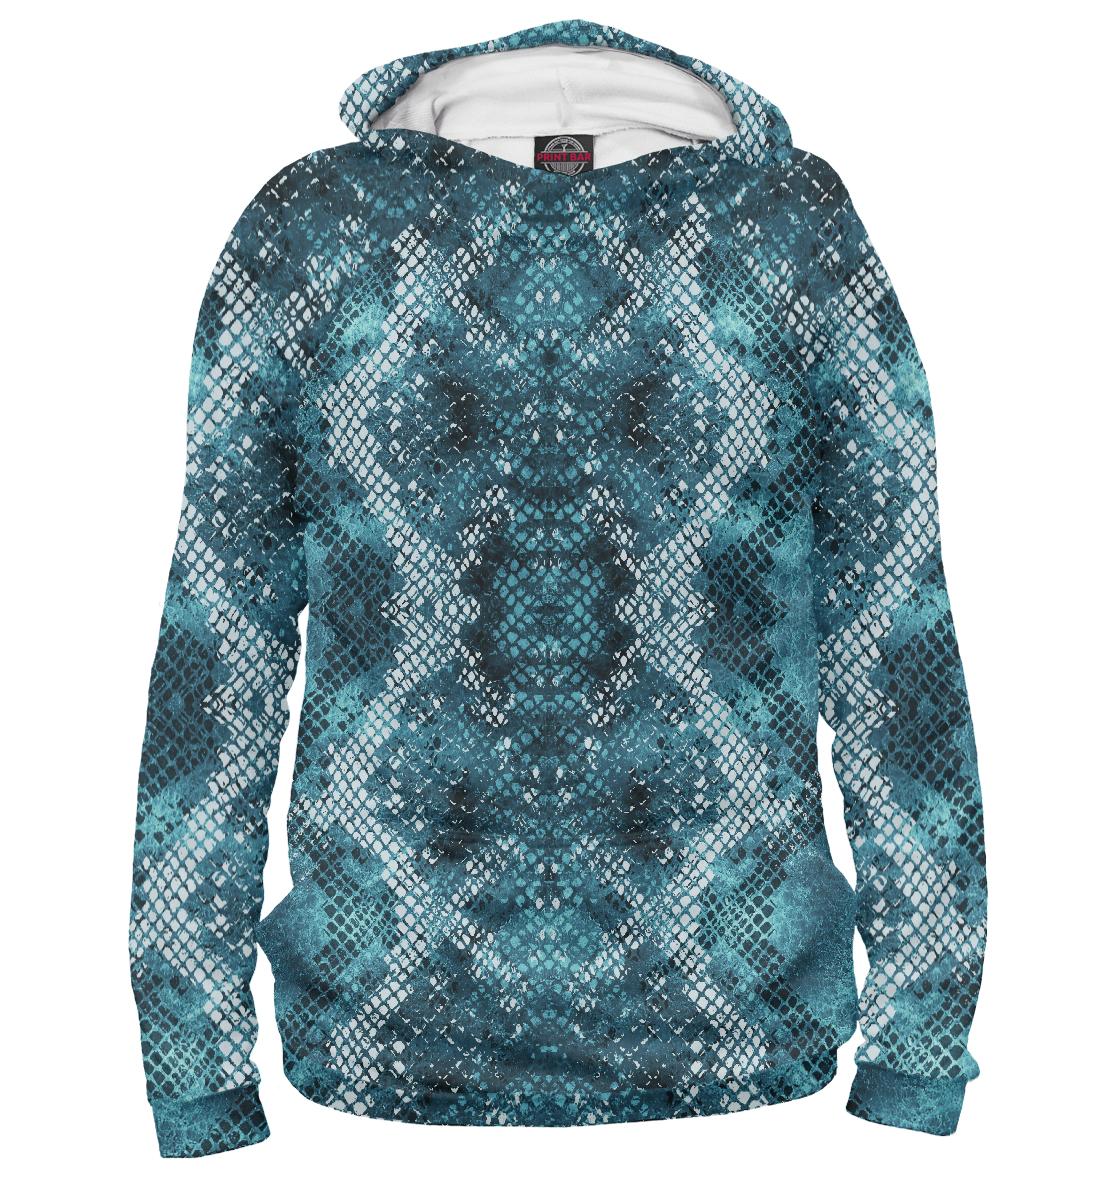 Купить Piton blue, Printbar, Худи, OKR-903131-hud-2